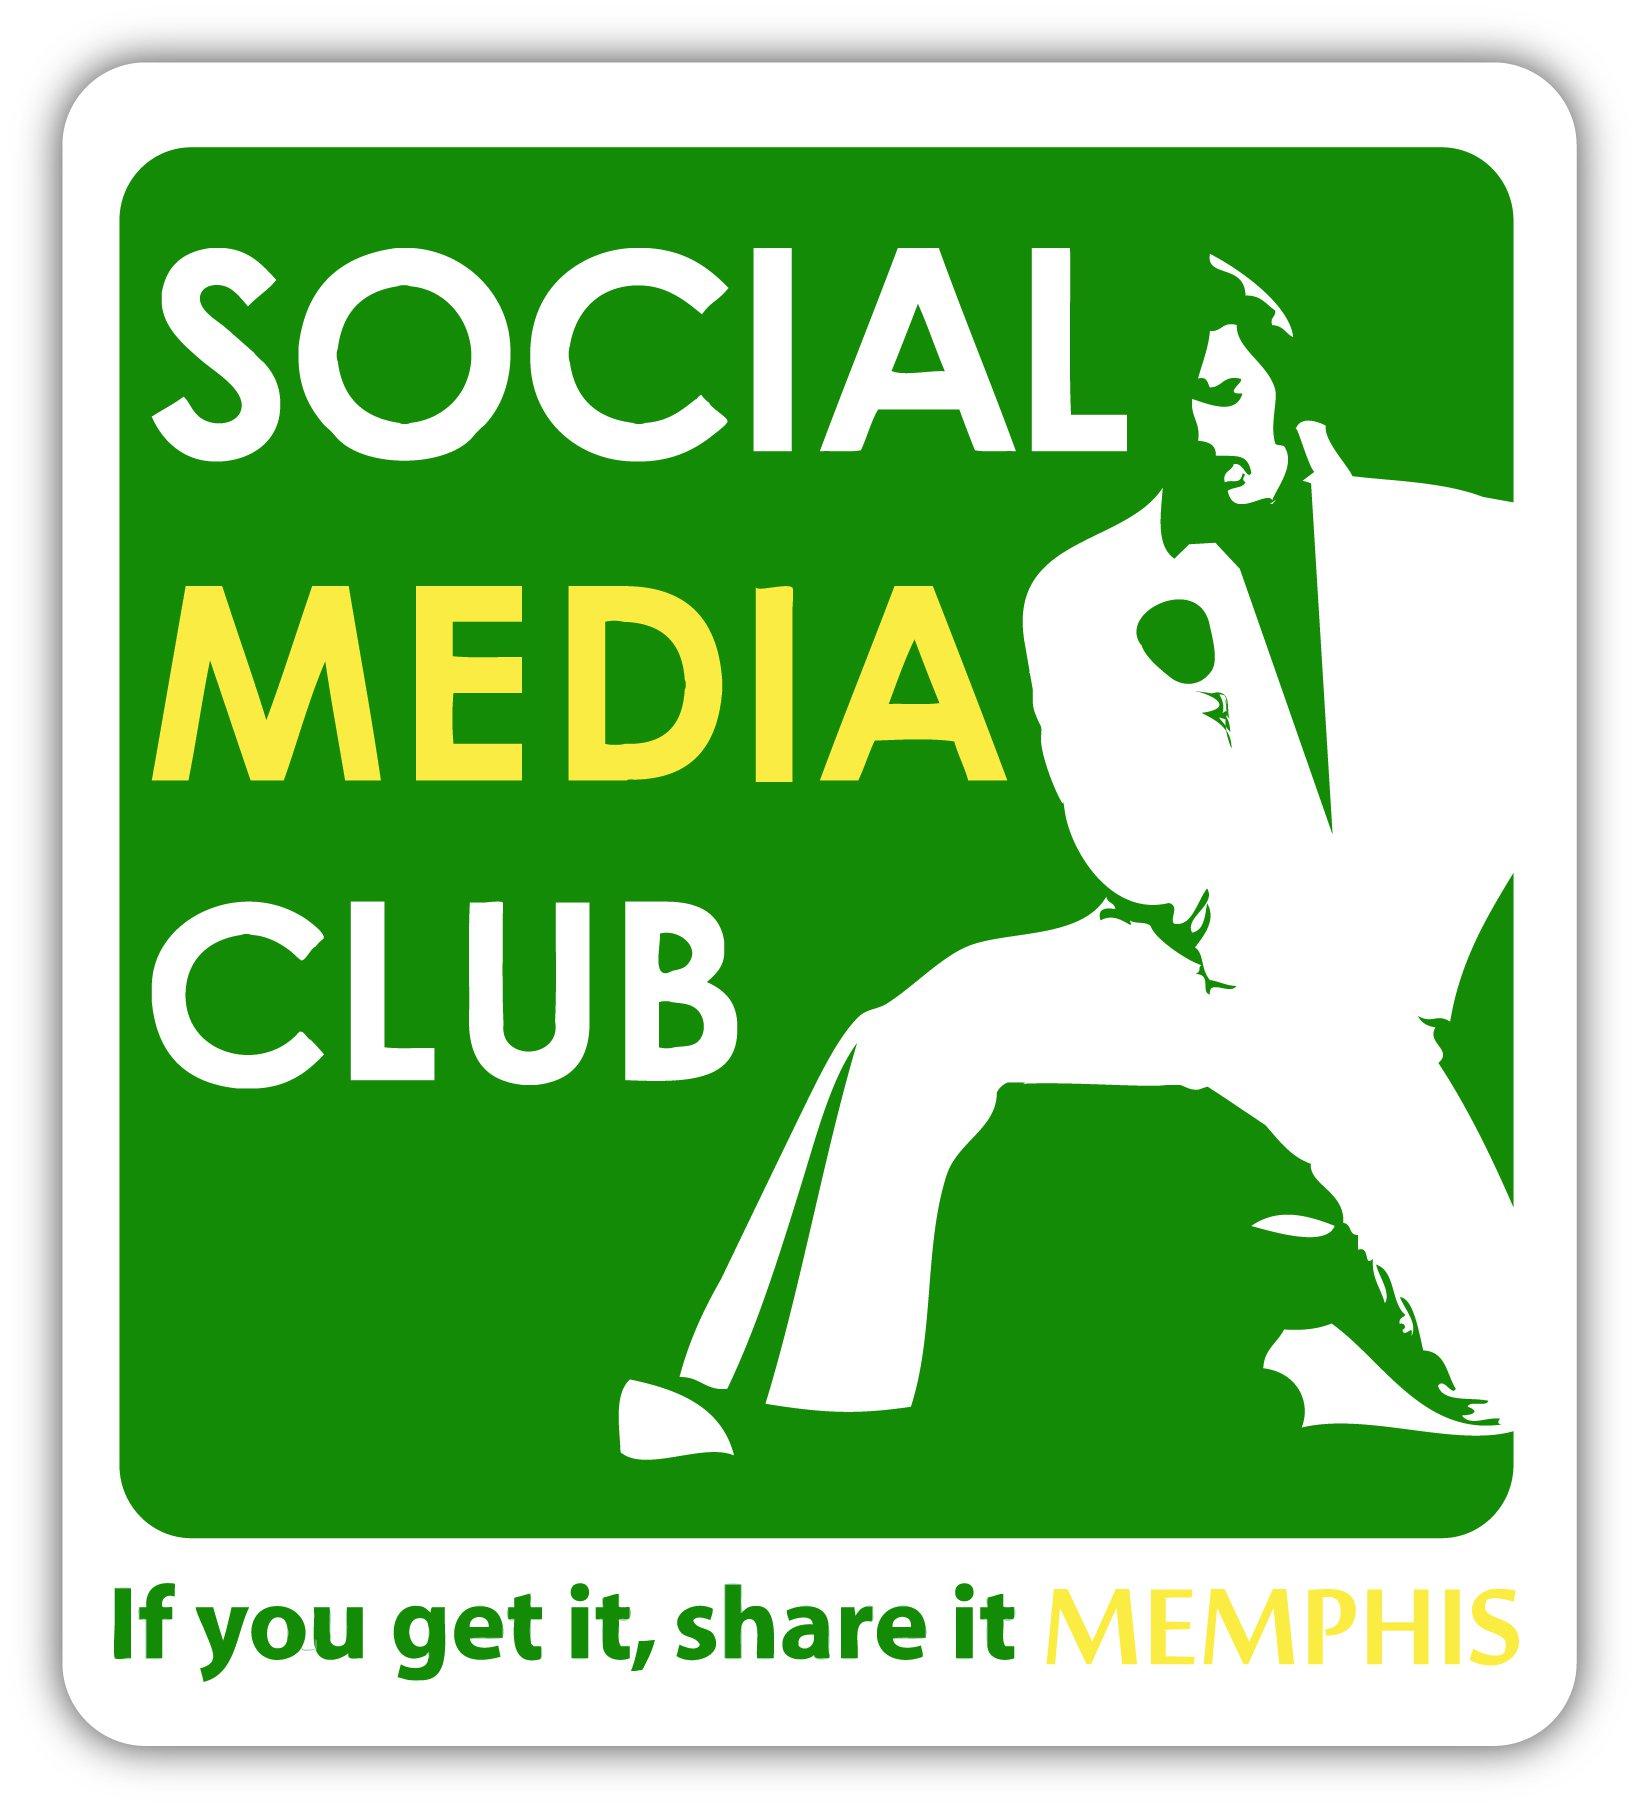 Memphis chapter is reborn as social media matures